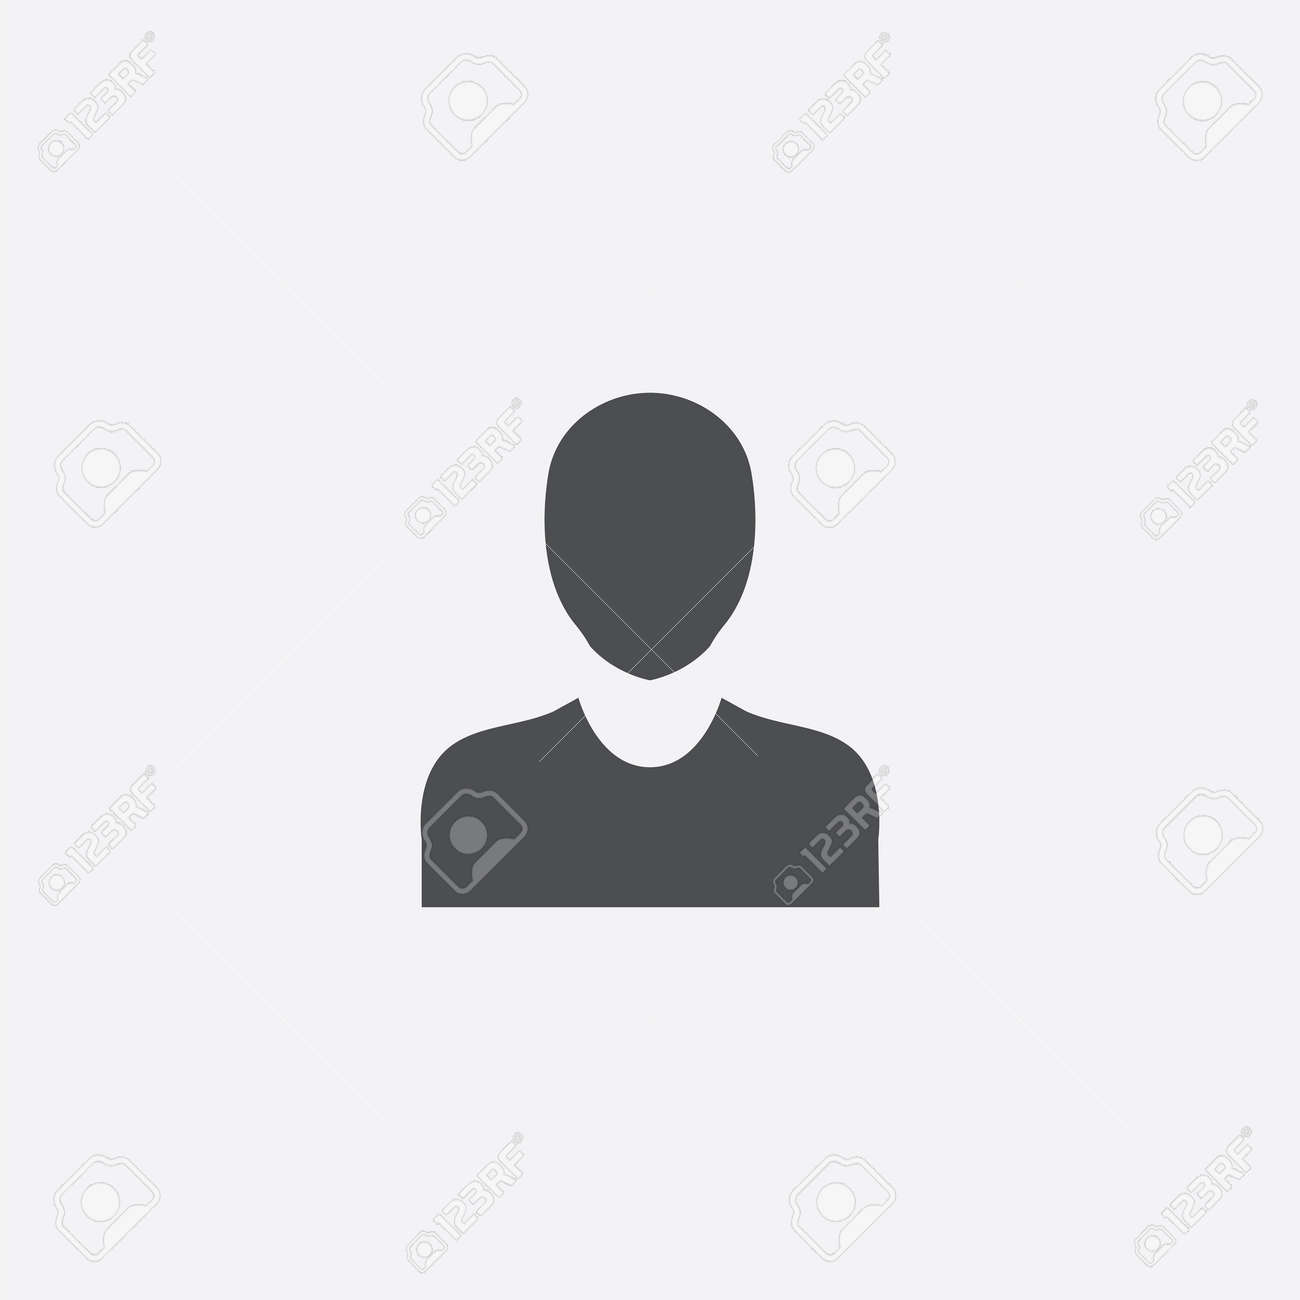 business avatar icon - 143059972